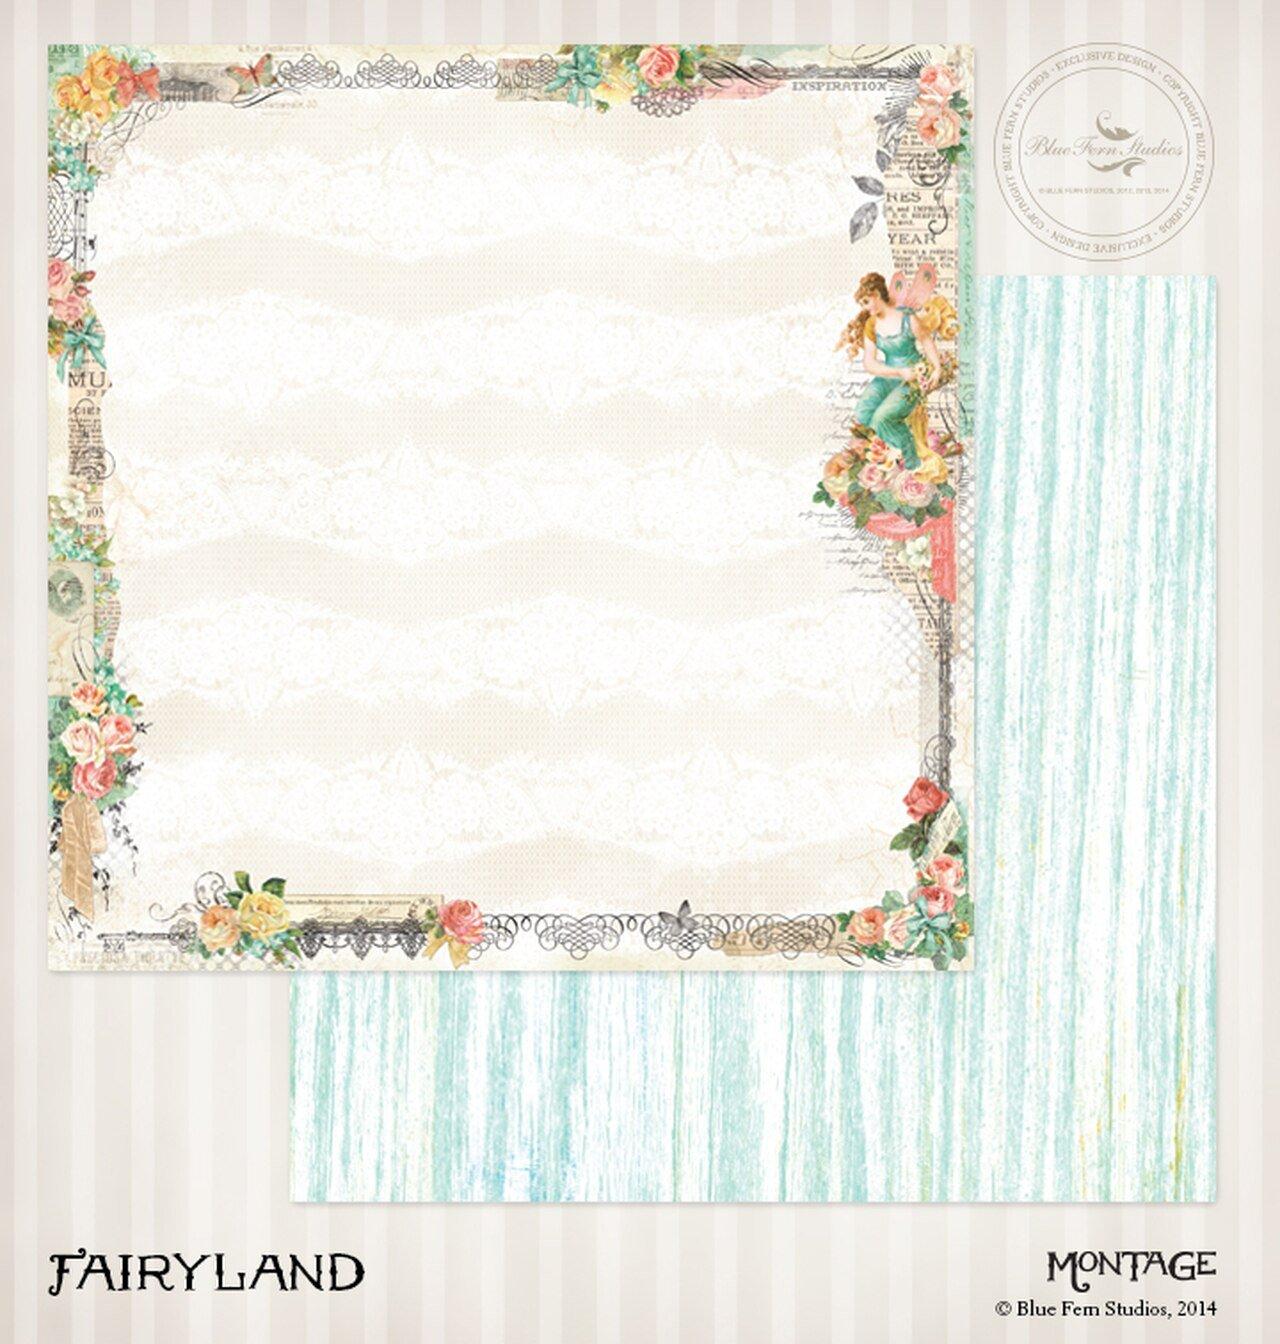 Blue Fern Studios - Fairyland 12x12 Paper